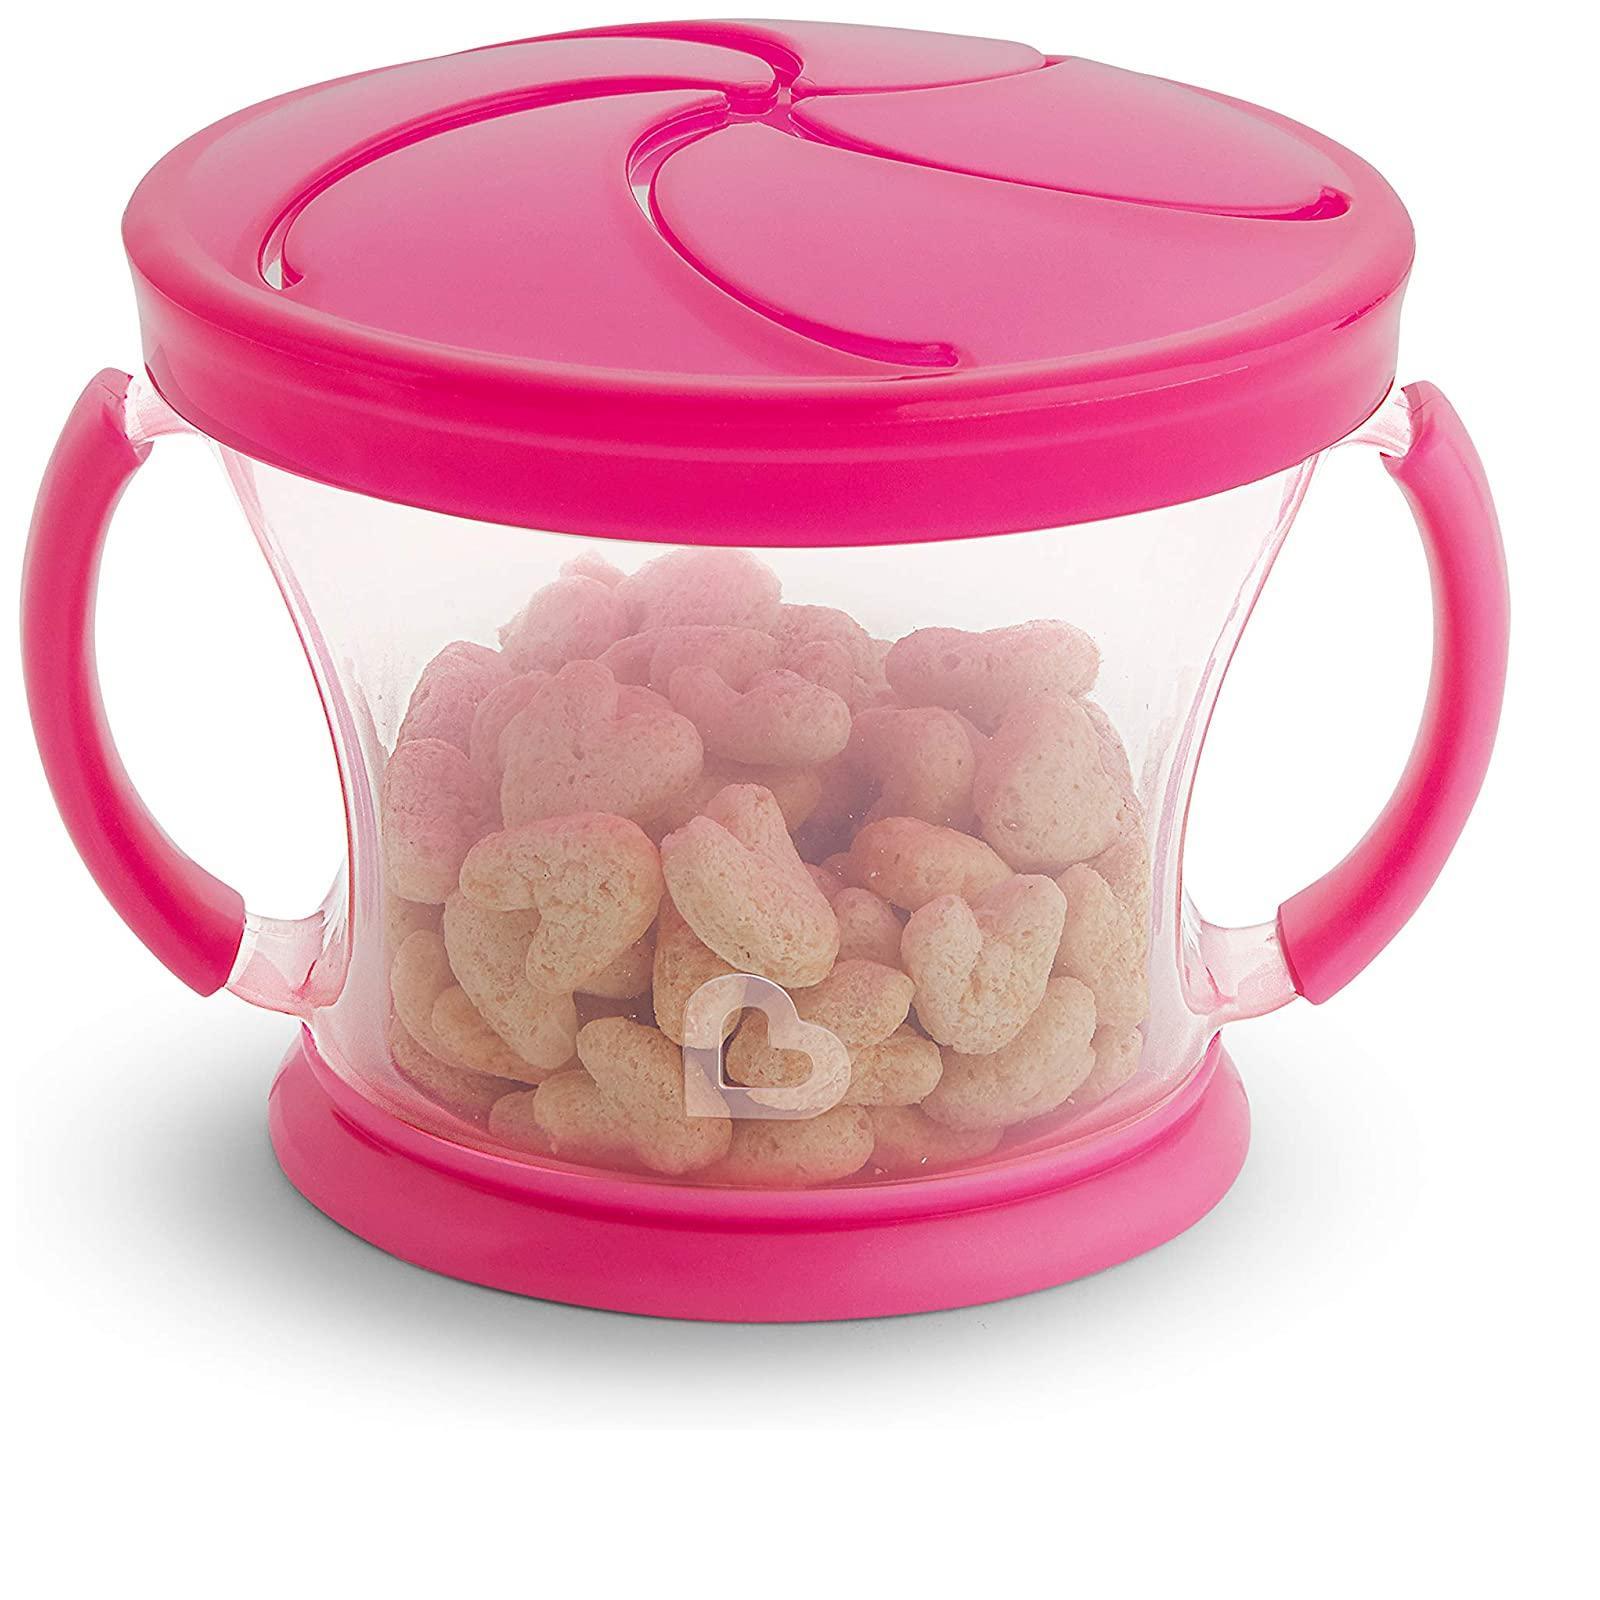 Kit com 2 Porta Snack Rosa e Roxo - Munchkin